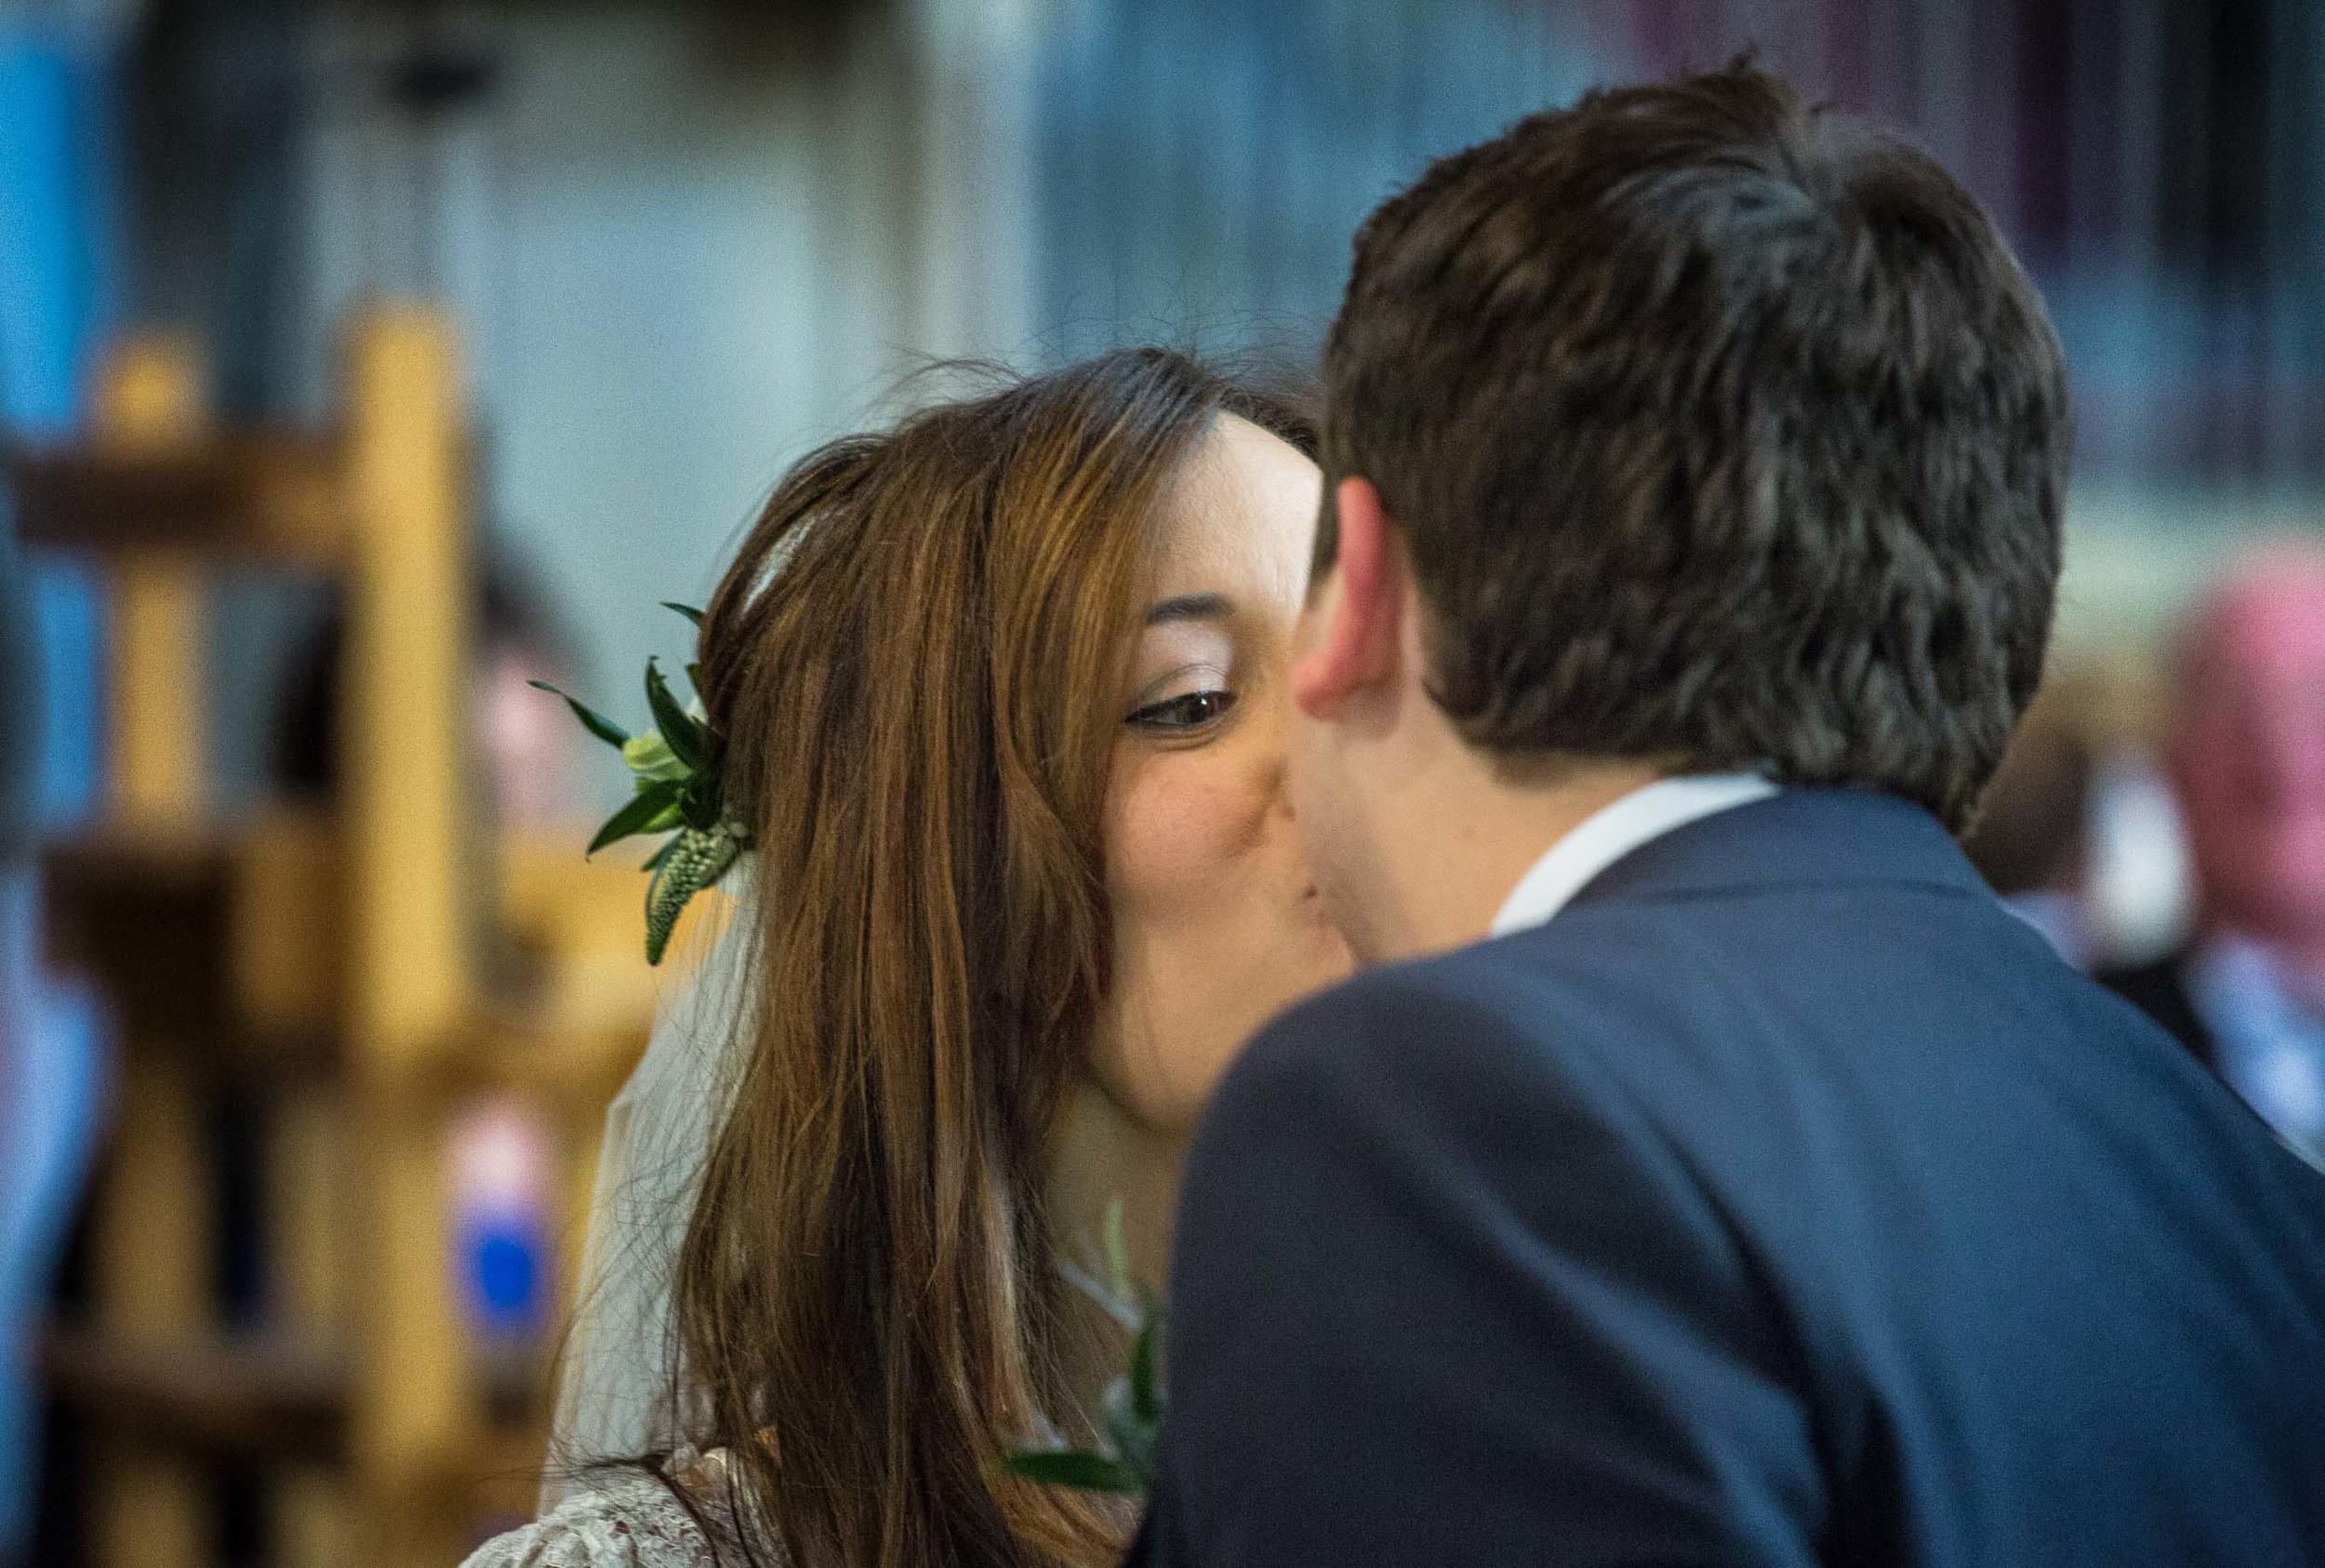 barnes-wedding-adam-rowley-photographer-kiss-at-the-altar